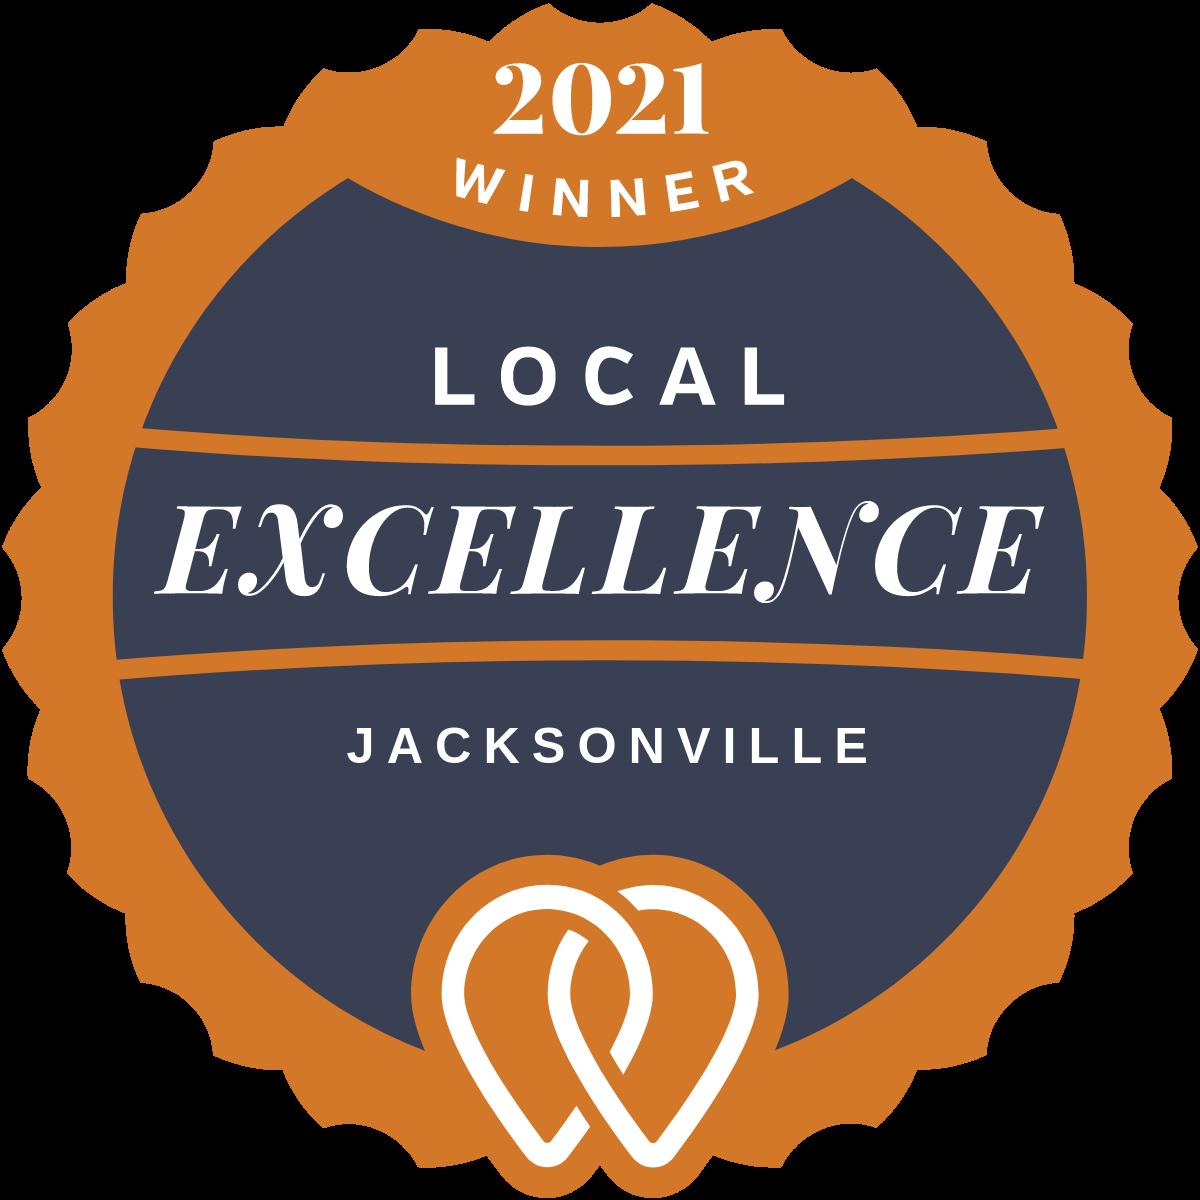 2021 Local Excellence Winner in Jacksonville, FL